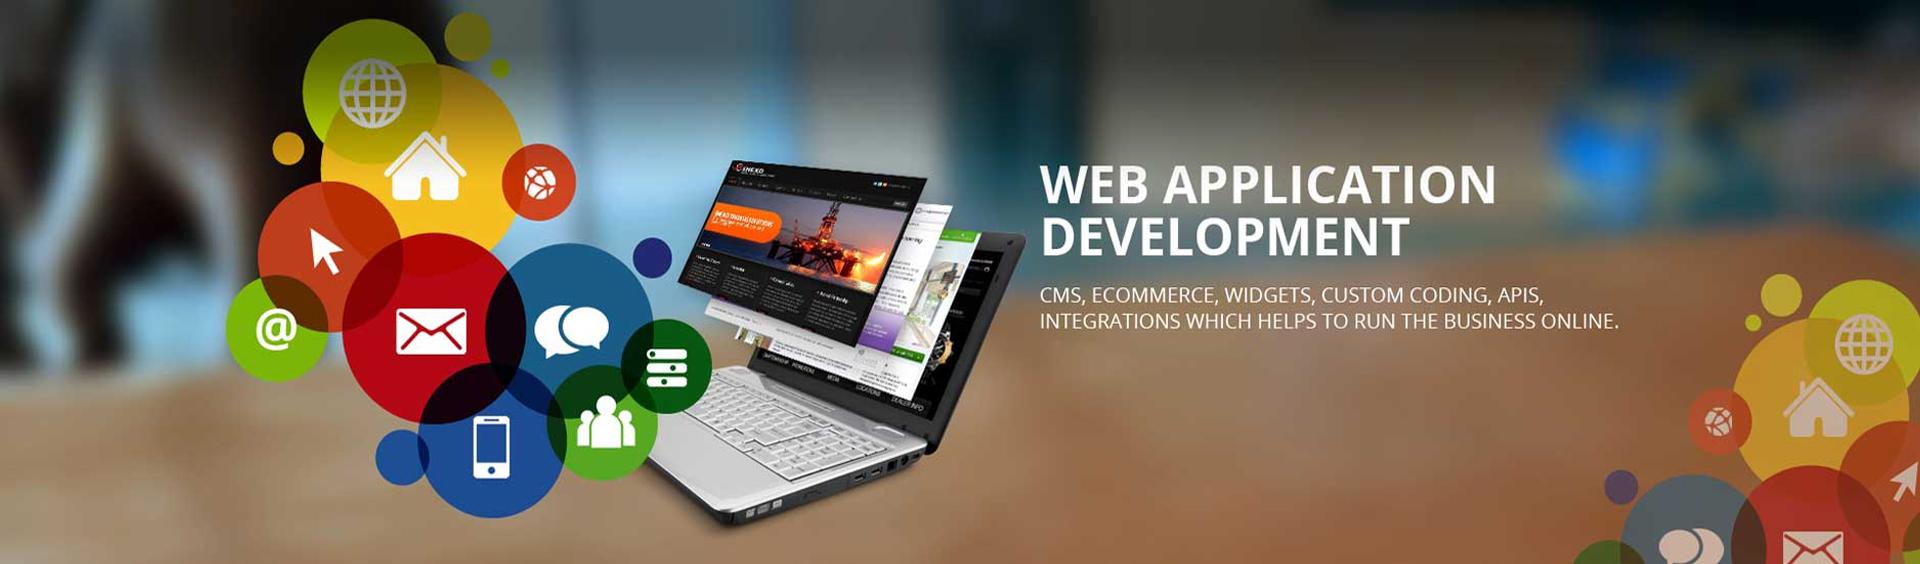 Web Application Development company Bangladesh